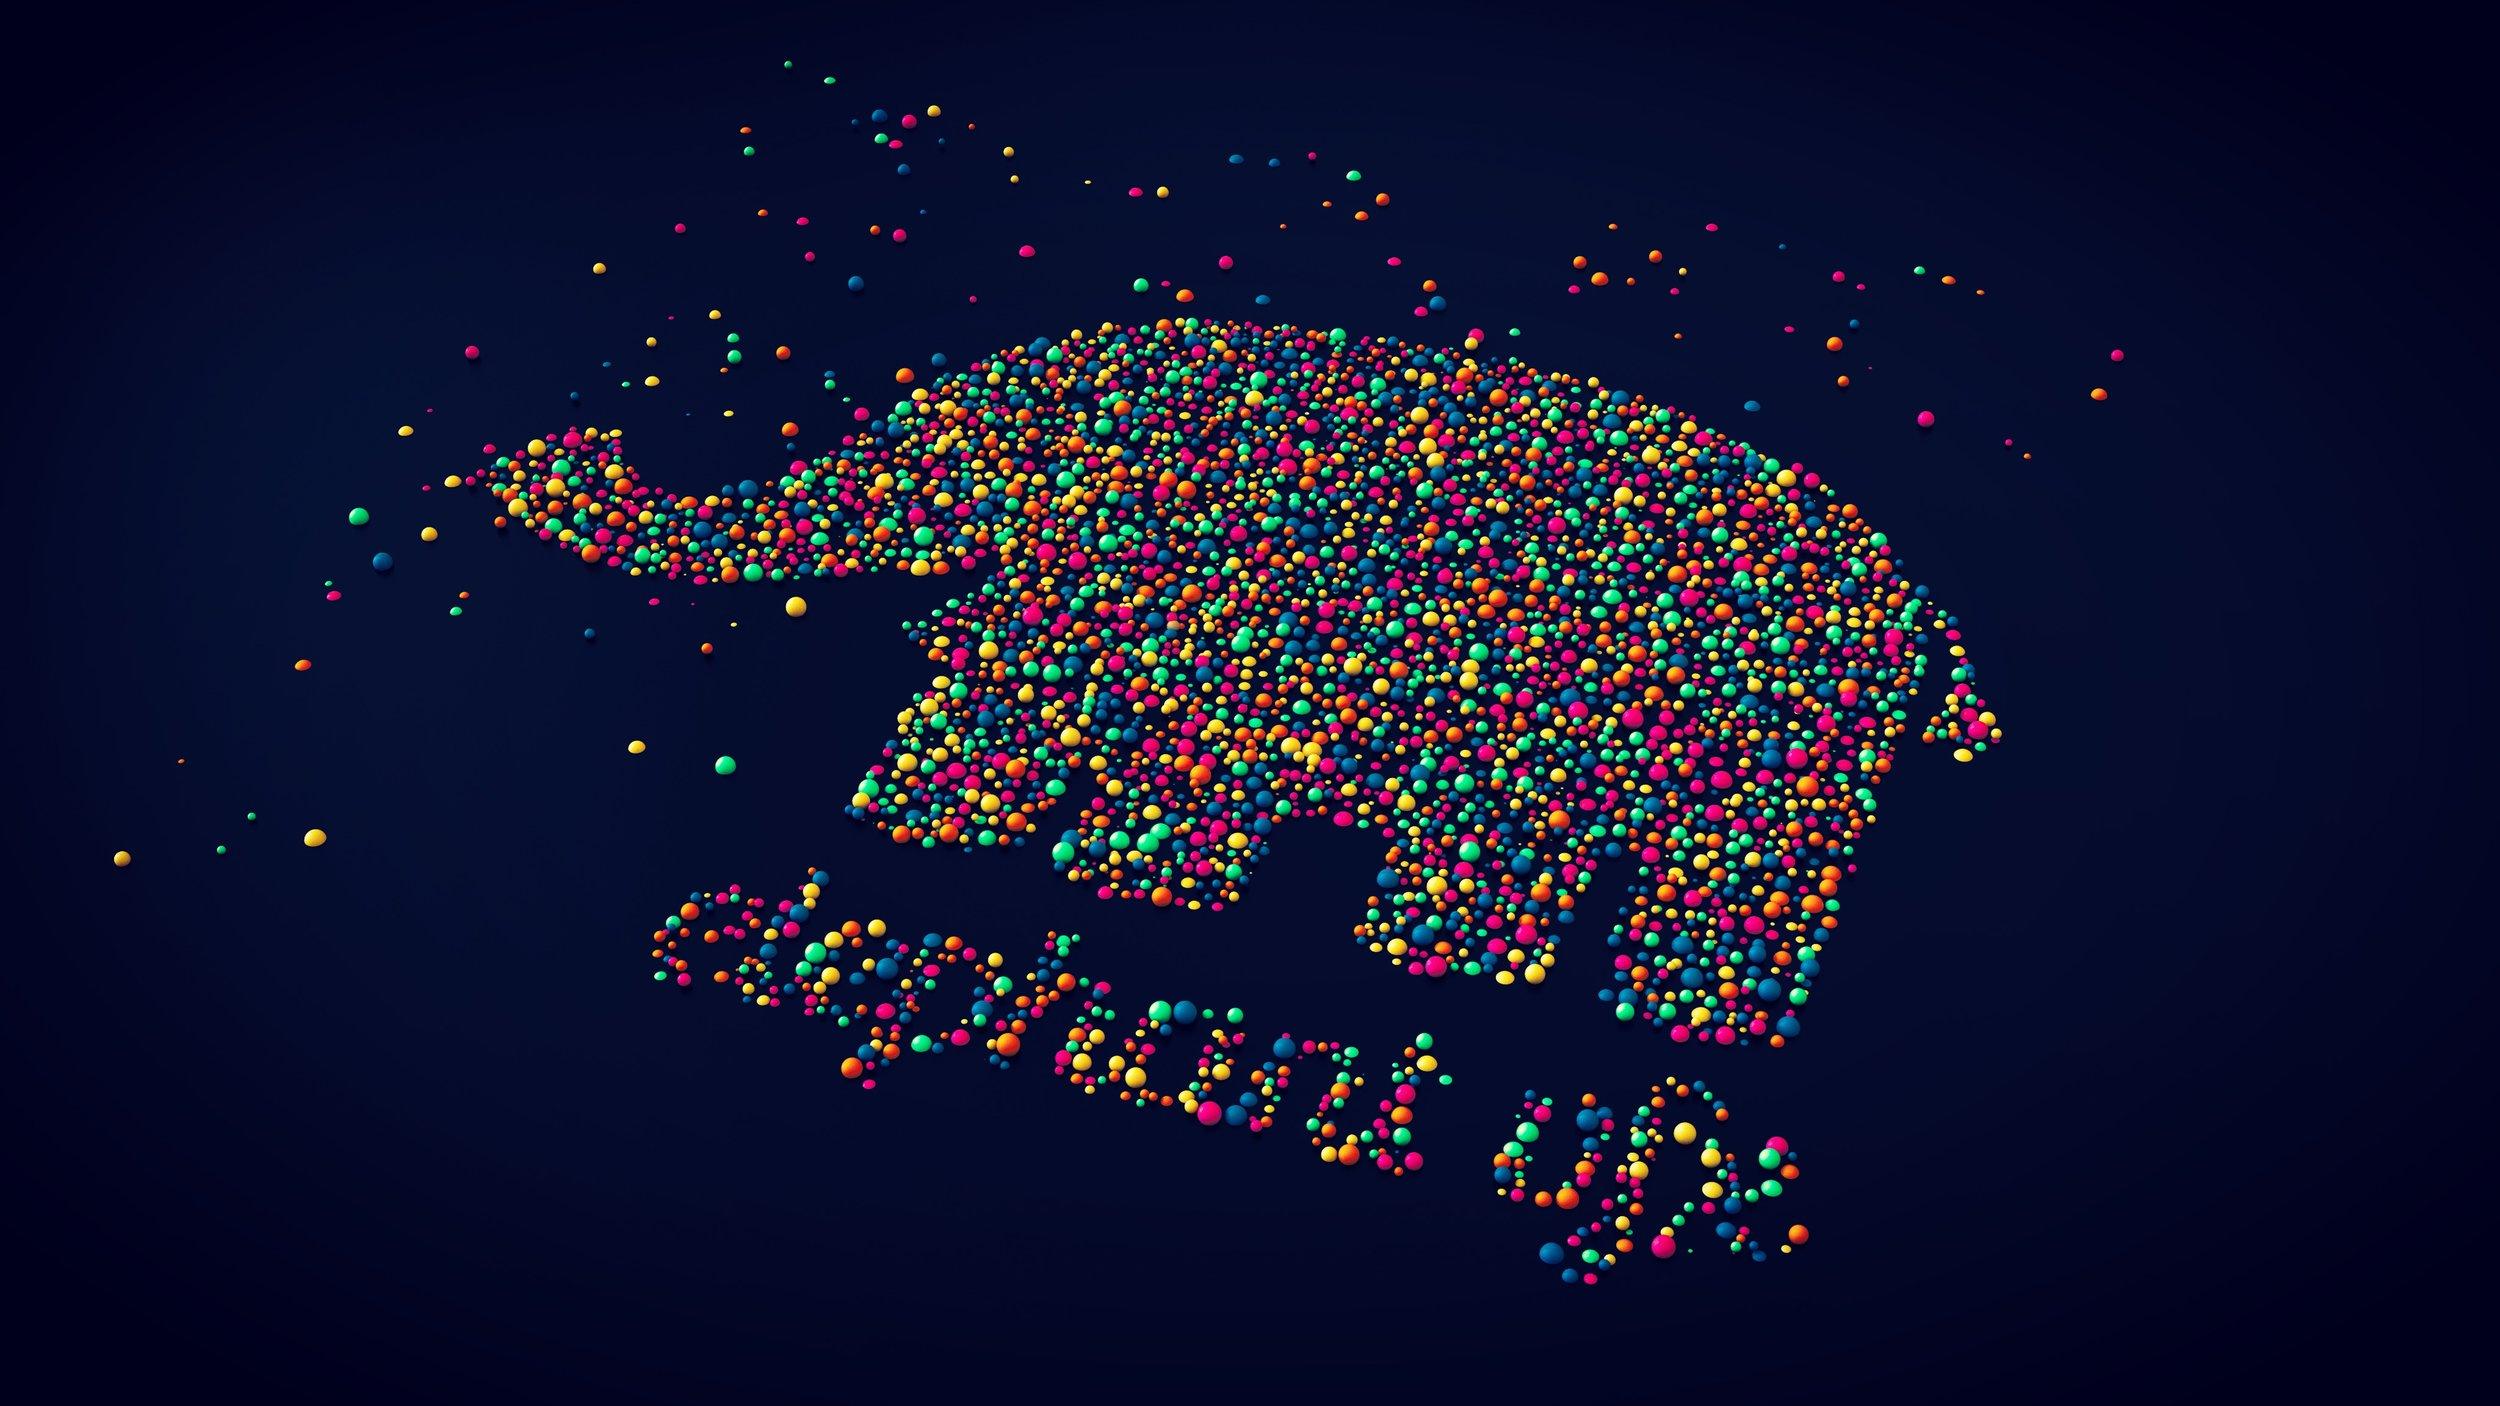 elephant_walpaper.JPG